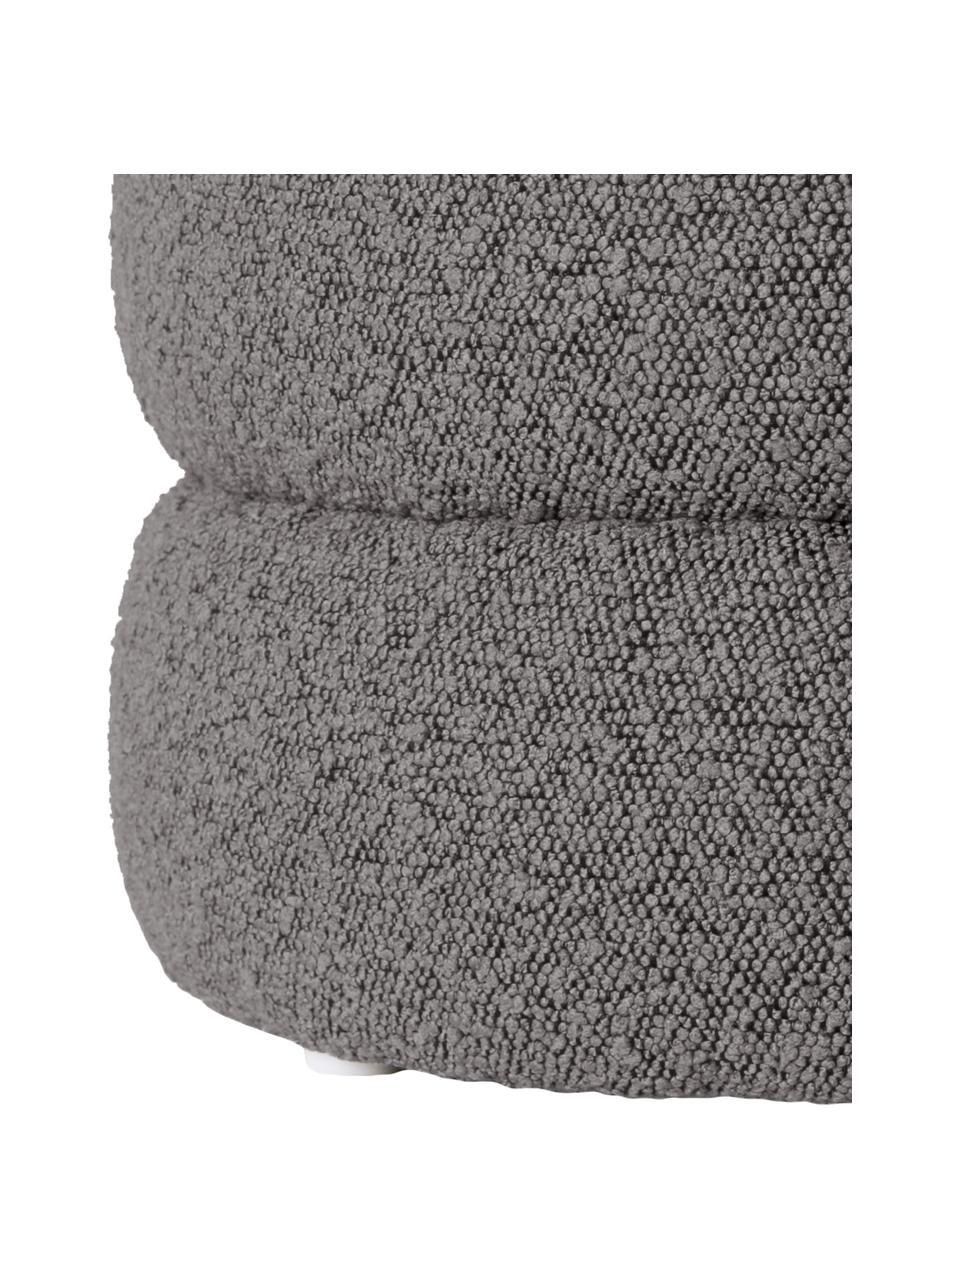 Bouclé-Hocker Alto in Grau, Bezug: Bouclé (100% Polyester) D, Gestell: Massives Kiefernholz, Spe, Bouclé Grau, Ø 42 x H 47 cm